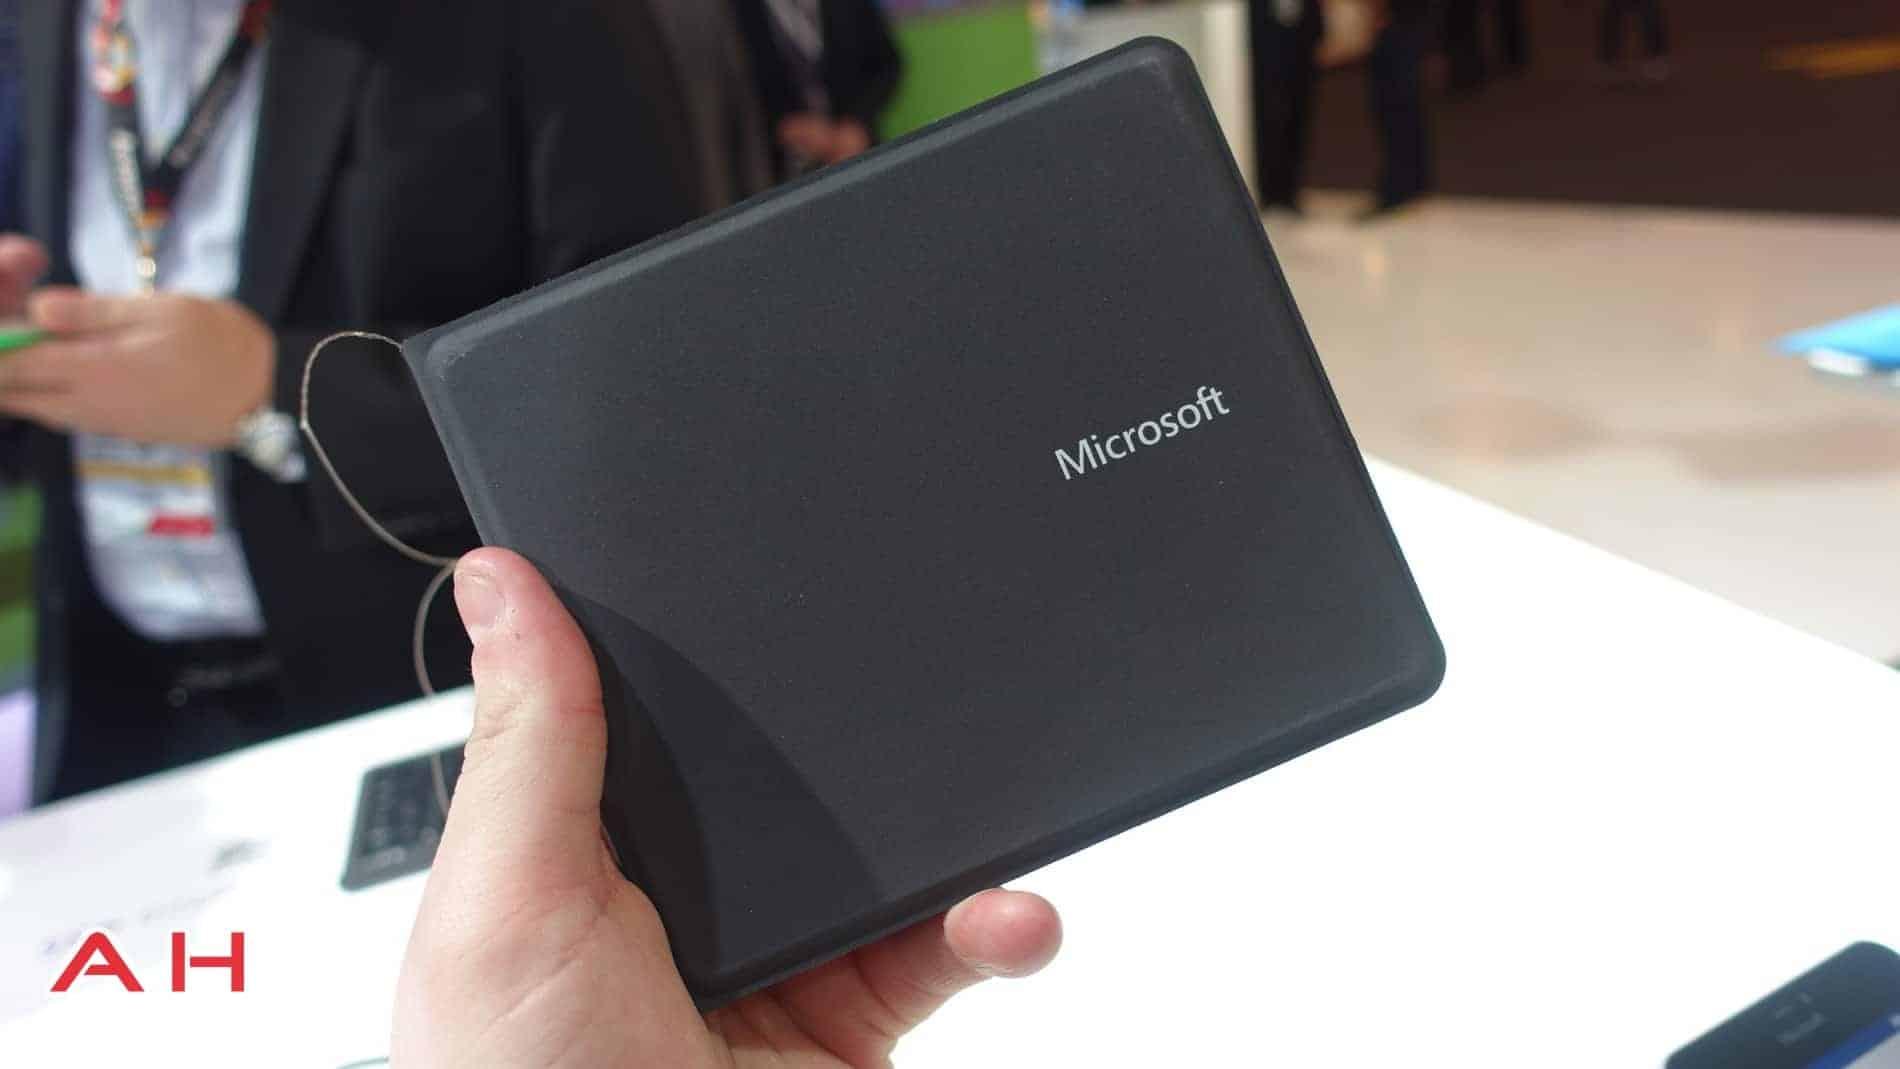 Microsoft Folding Keyboard AH 03